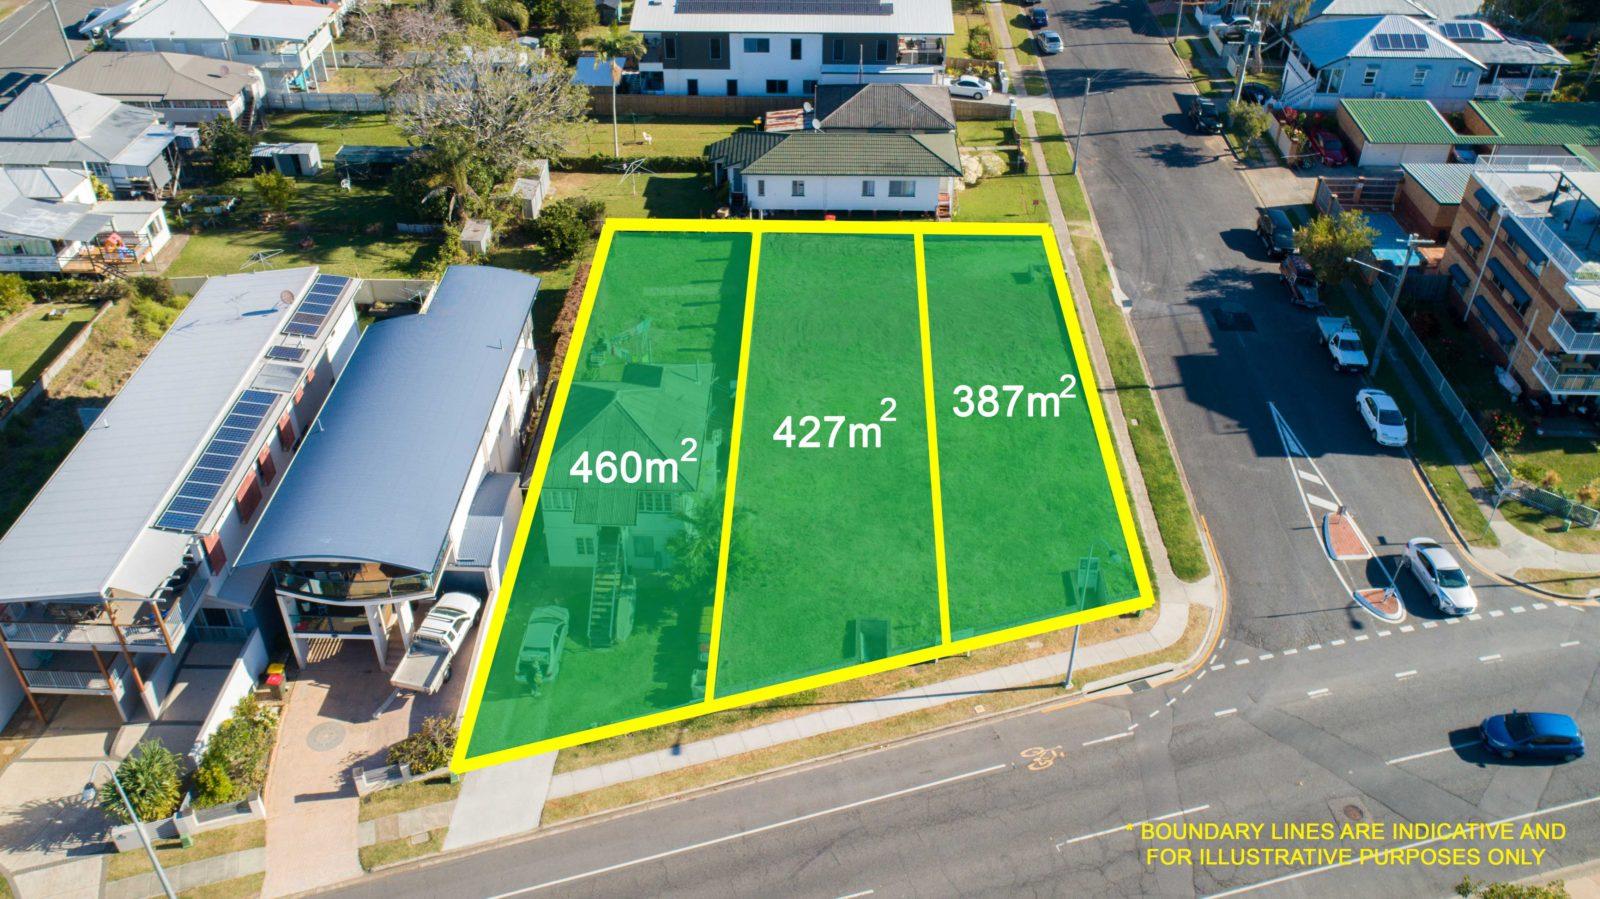 Drone inspections drone surveying Brisbane Australia